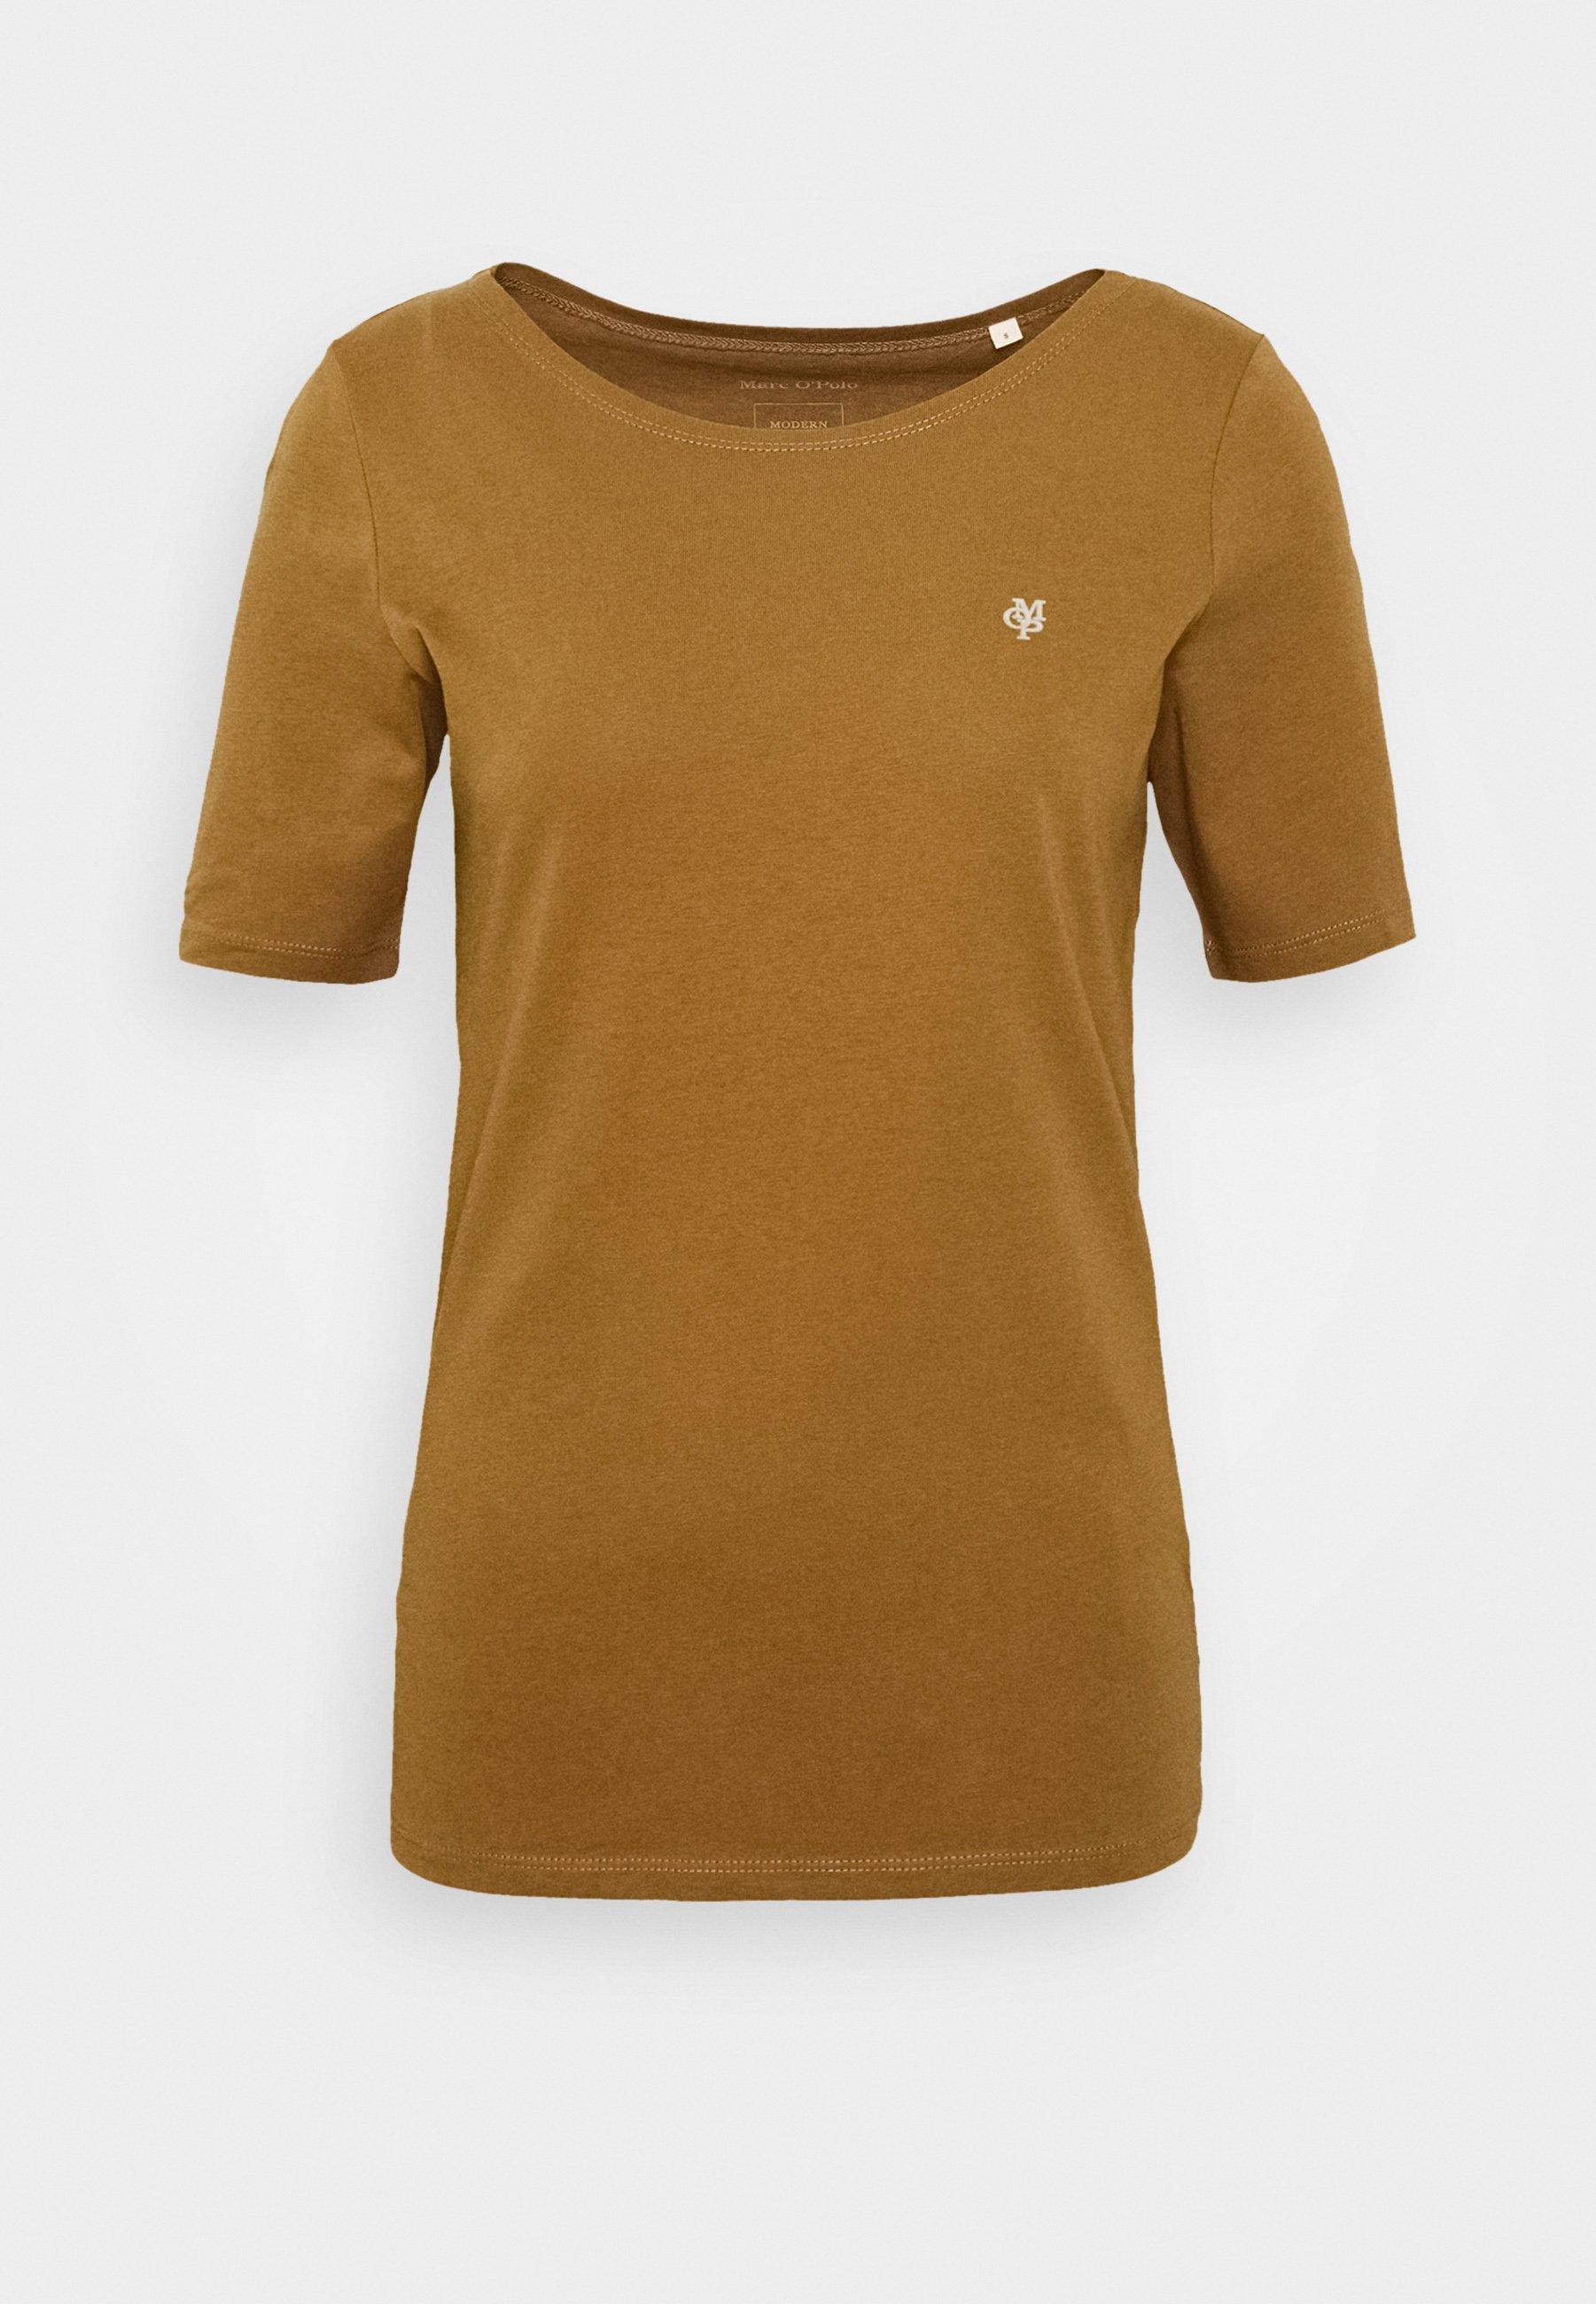 Marc O'polo Short Sleeve Roundneck - T-shirts Deep Tobacco/brun